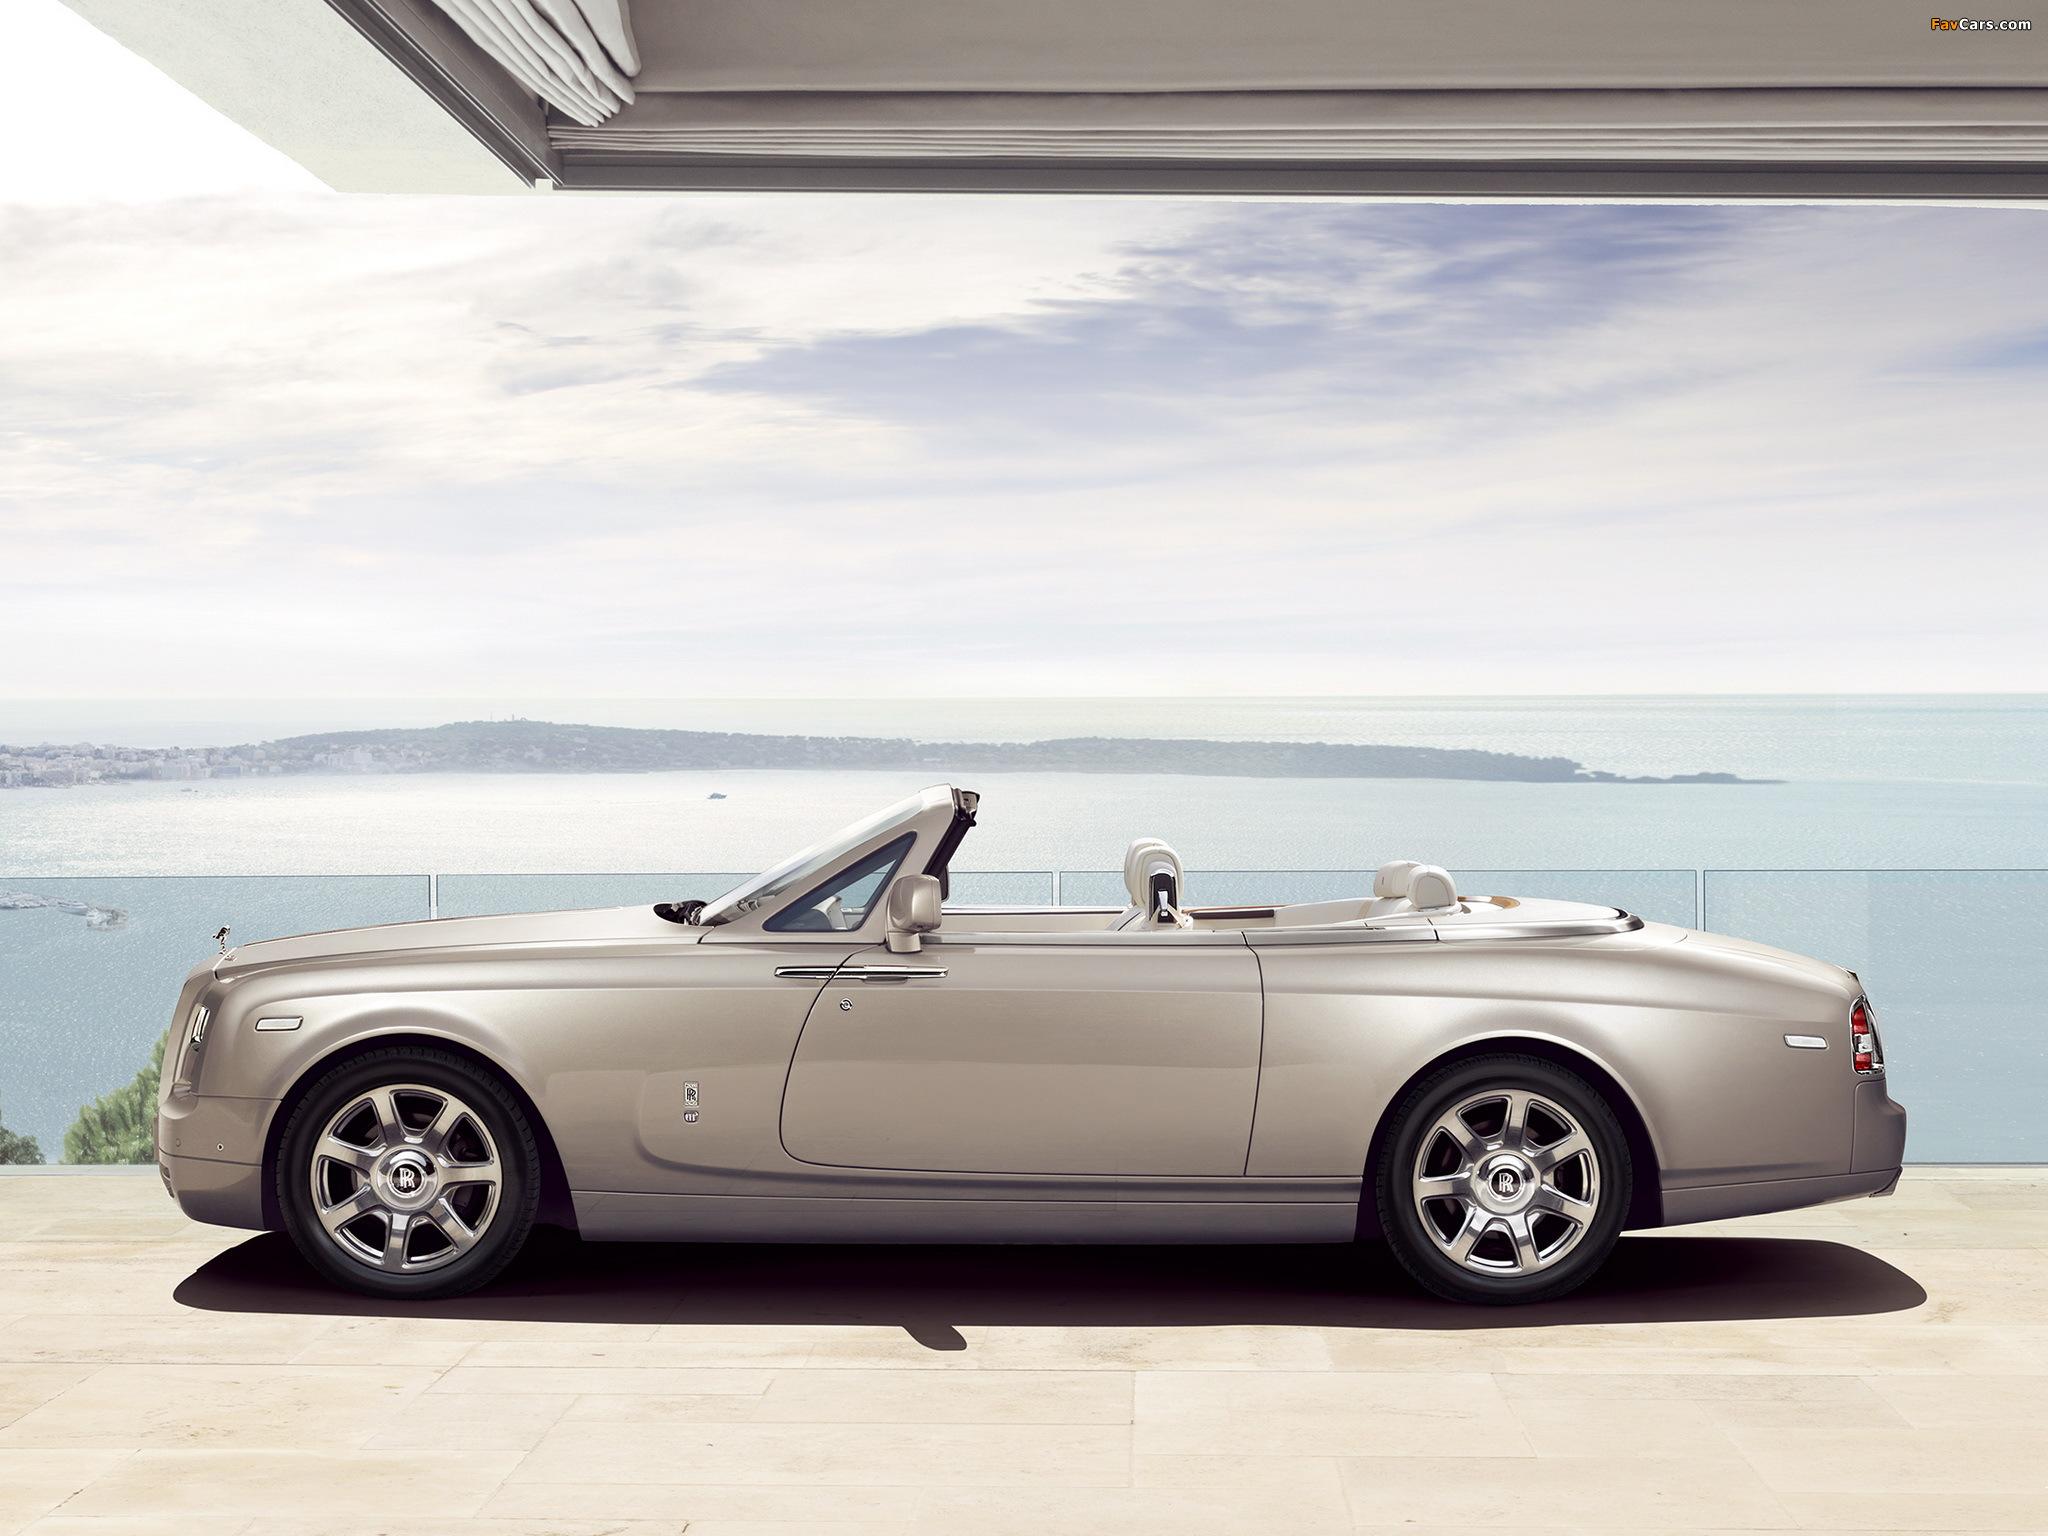 Rolls-Royce Phantom Drophead Coupe 2012 photos (2048 x 1536)